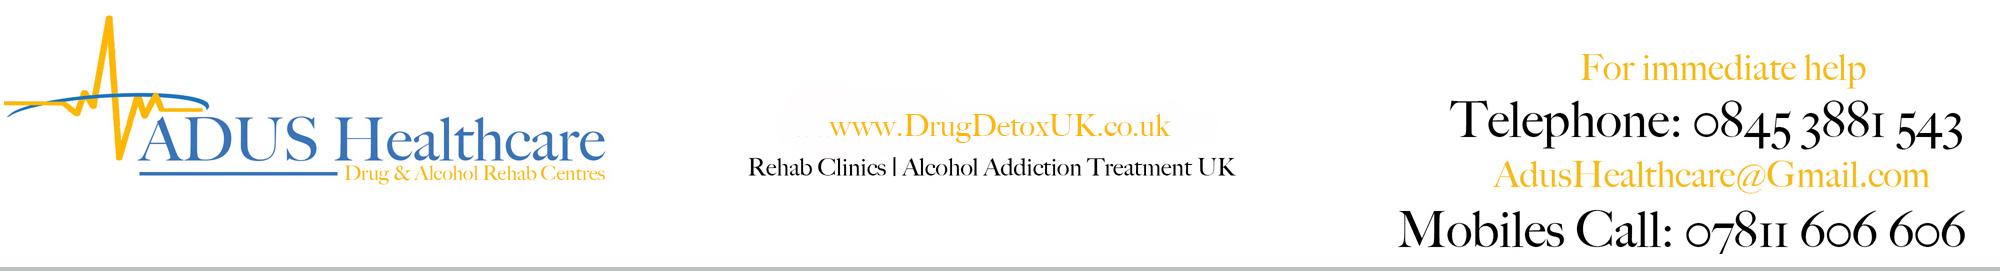 Drug Detox UK